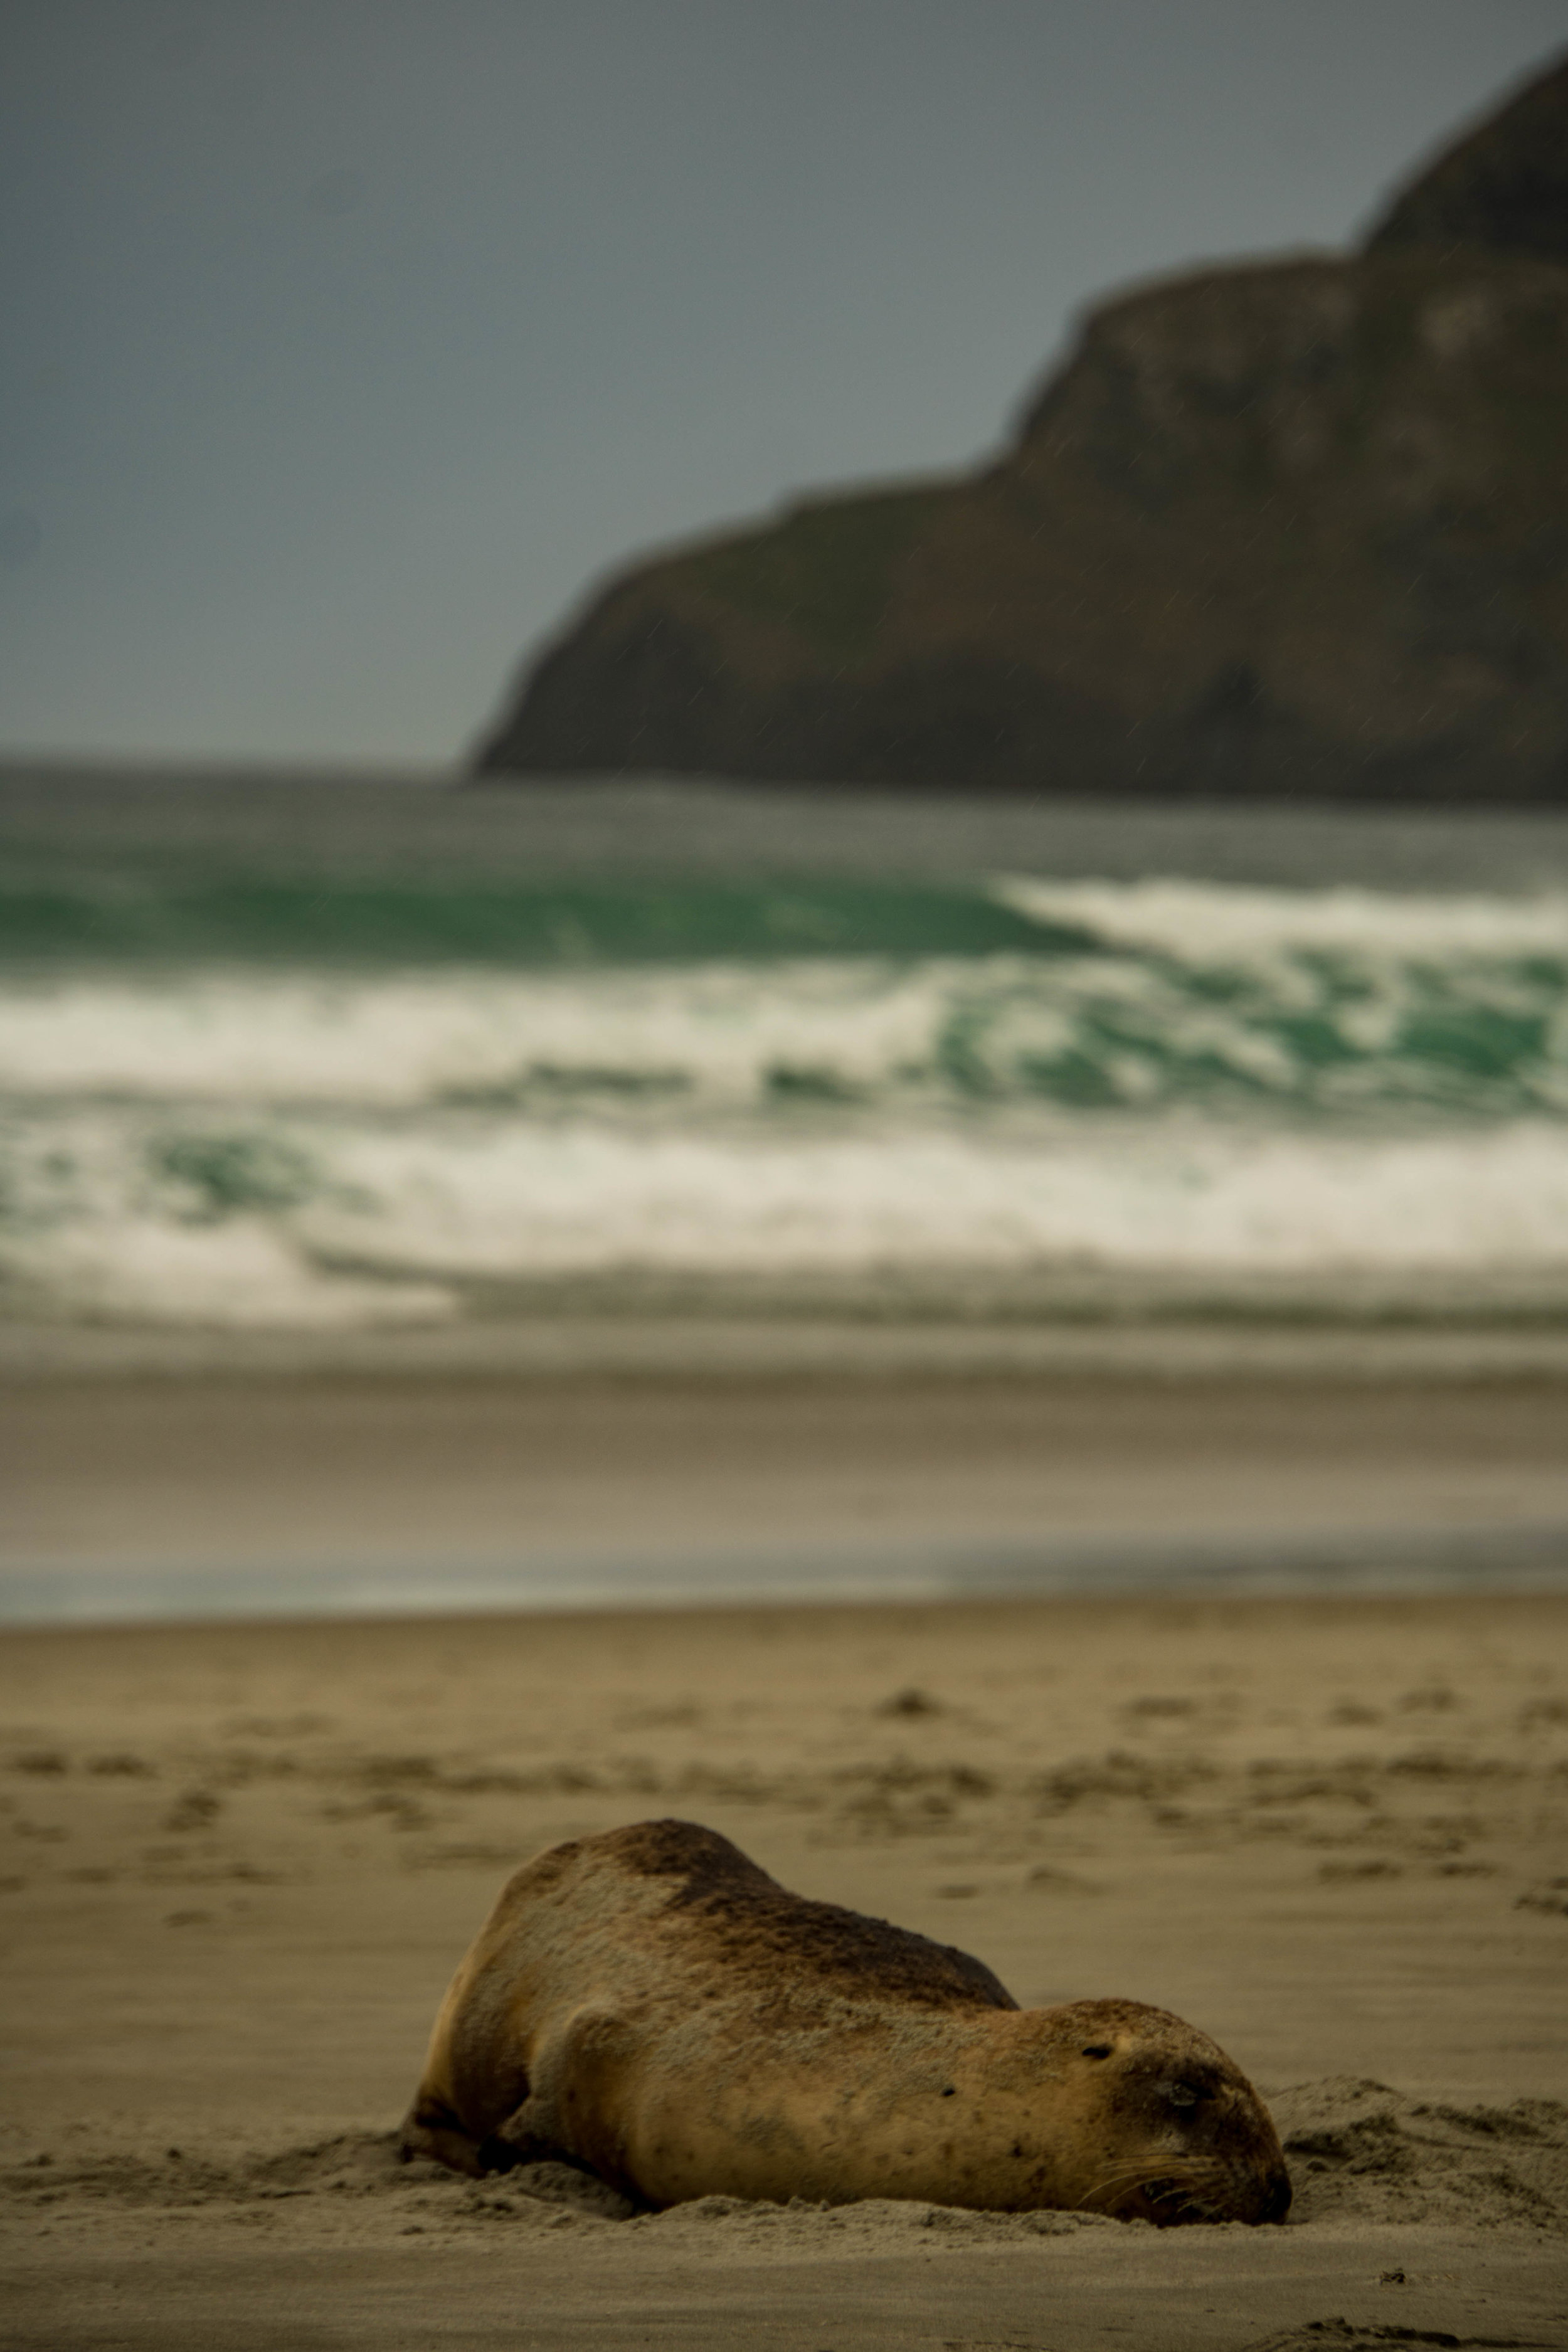 An unexpected encounter with a NZ Sea Lion,among the world's rarest pinnipeds. Otago Peninsula, New Zealand.